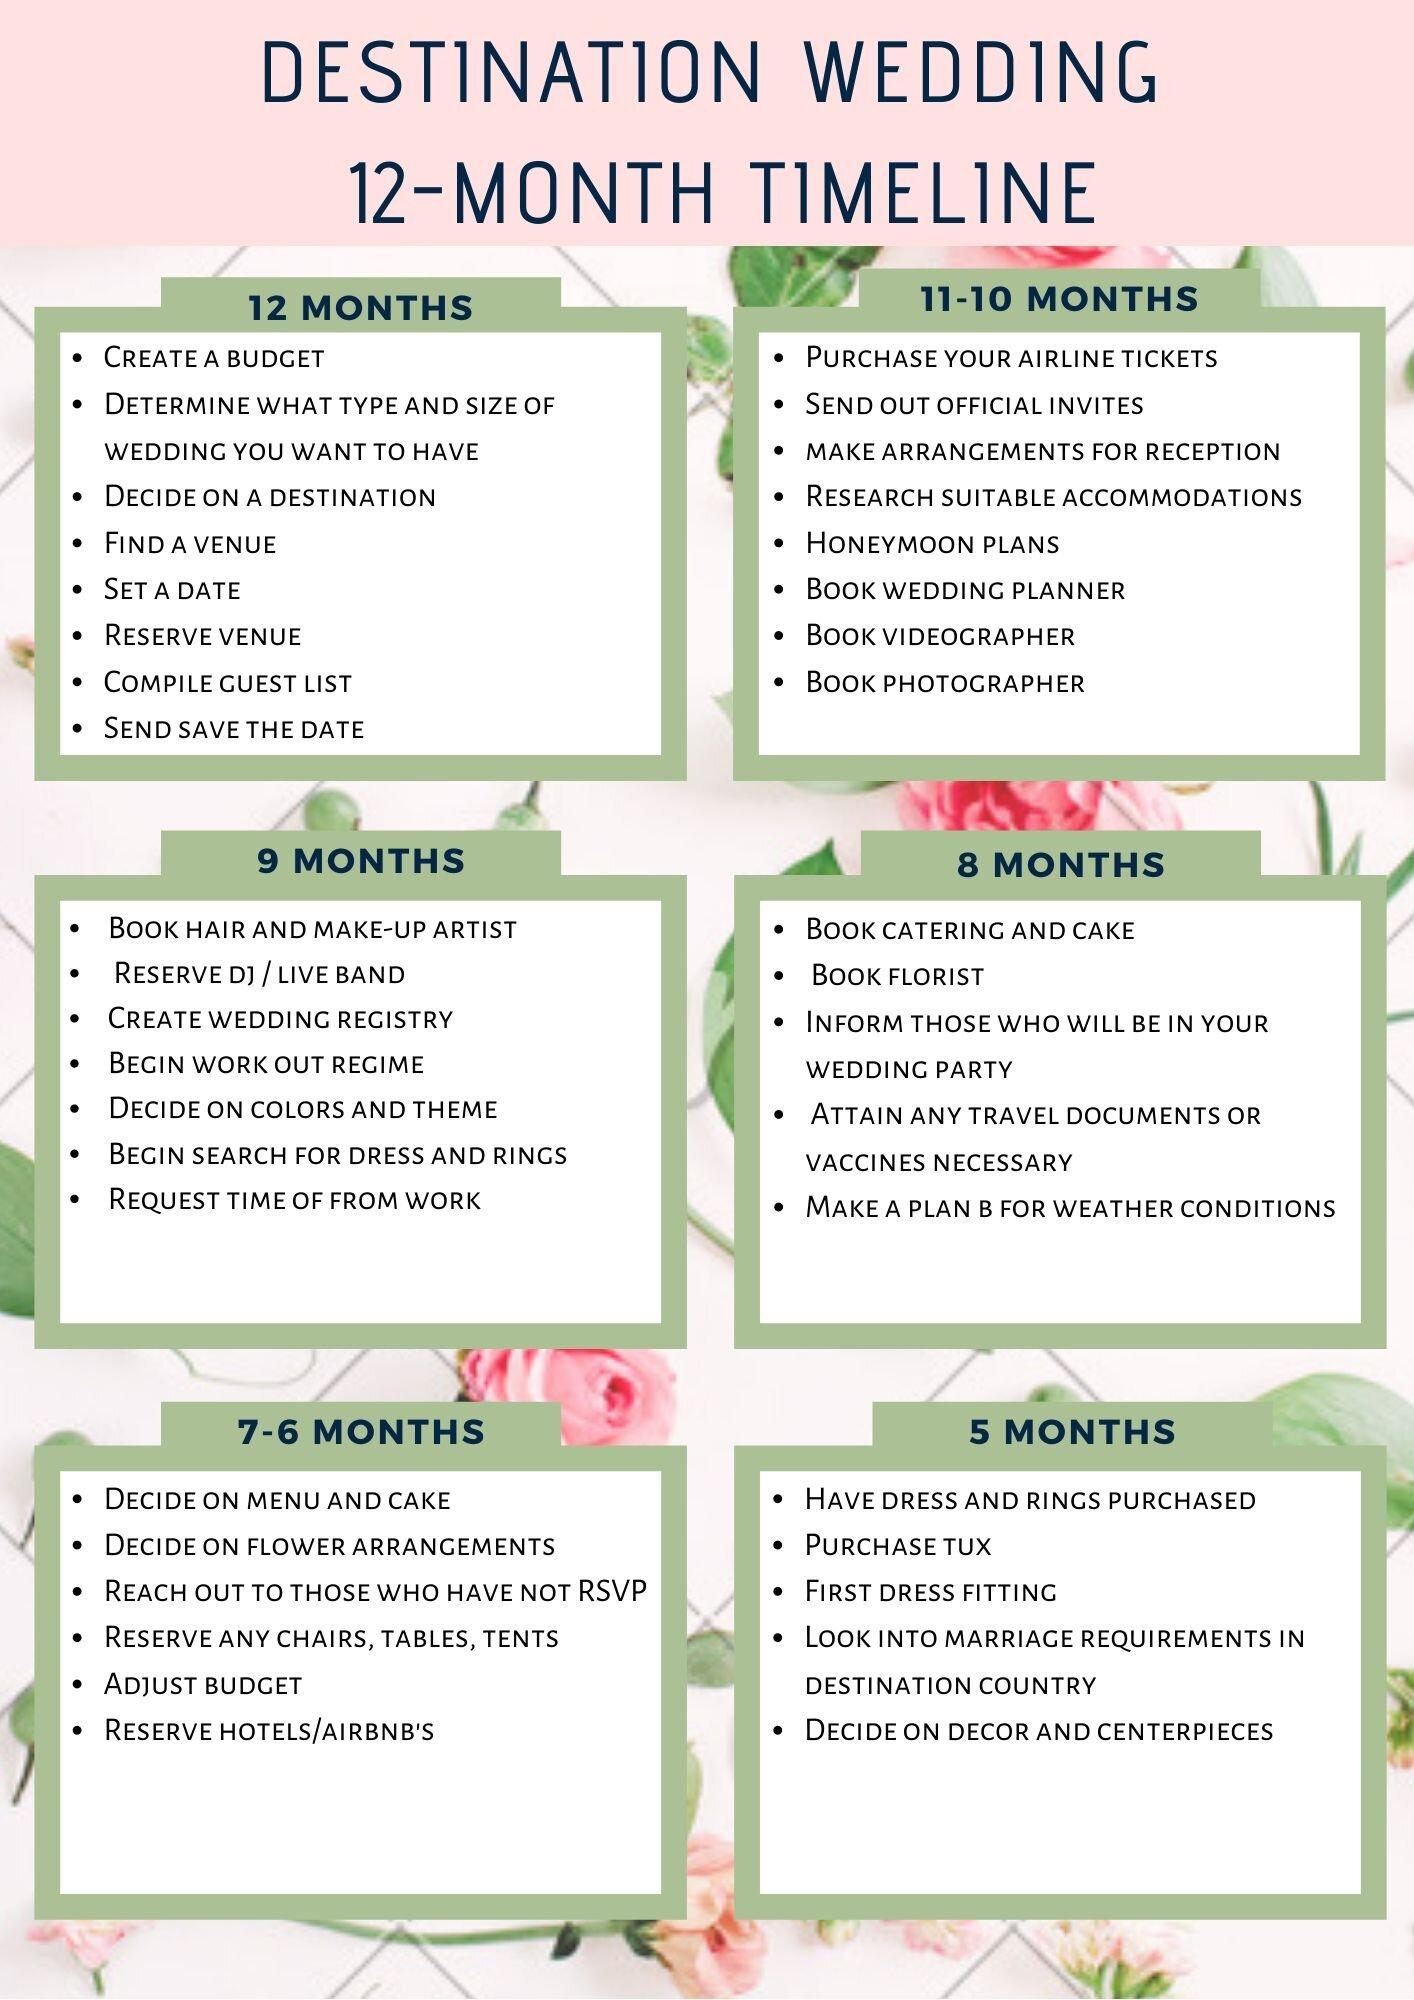 Planning Your Destination Wedding Timeline Checklist El Ancla